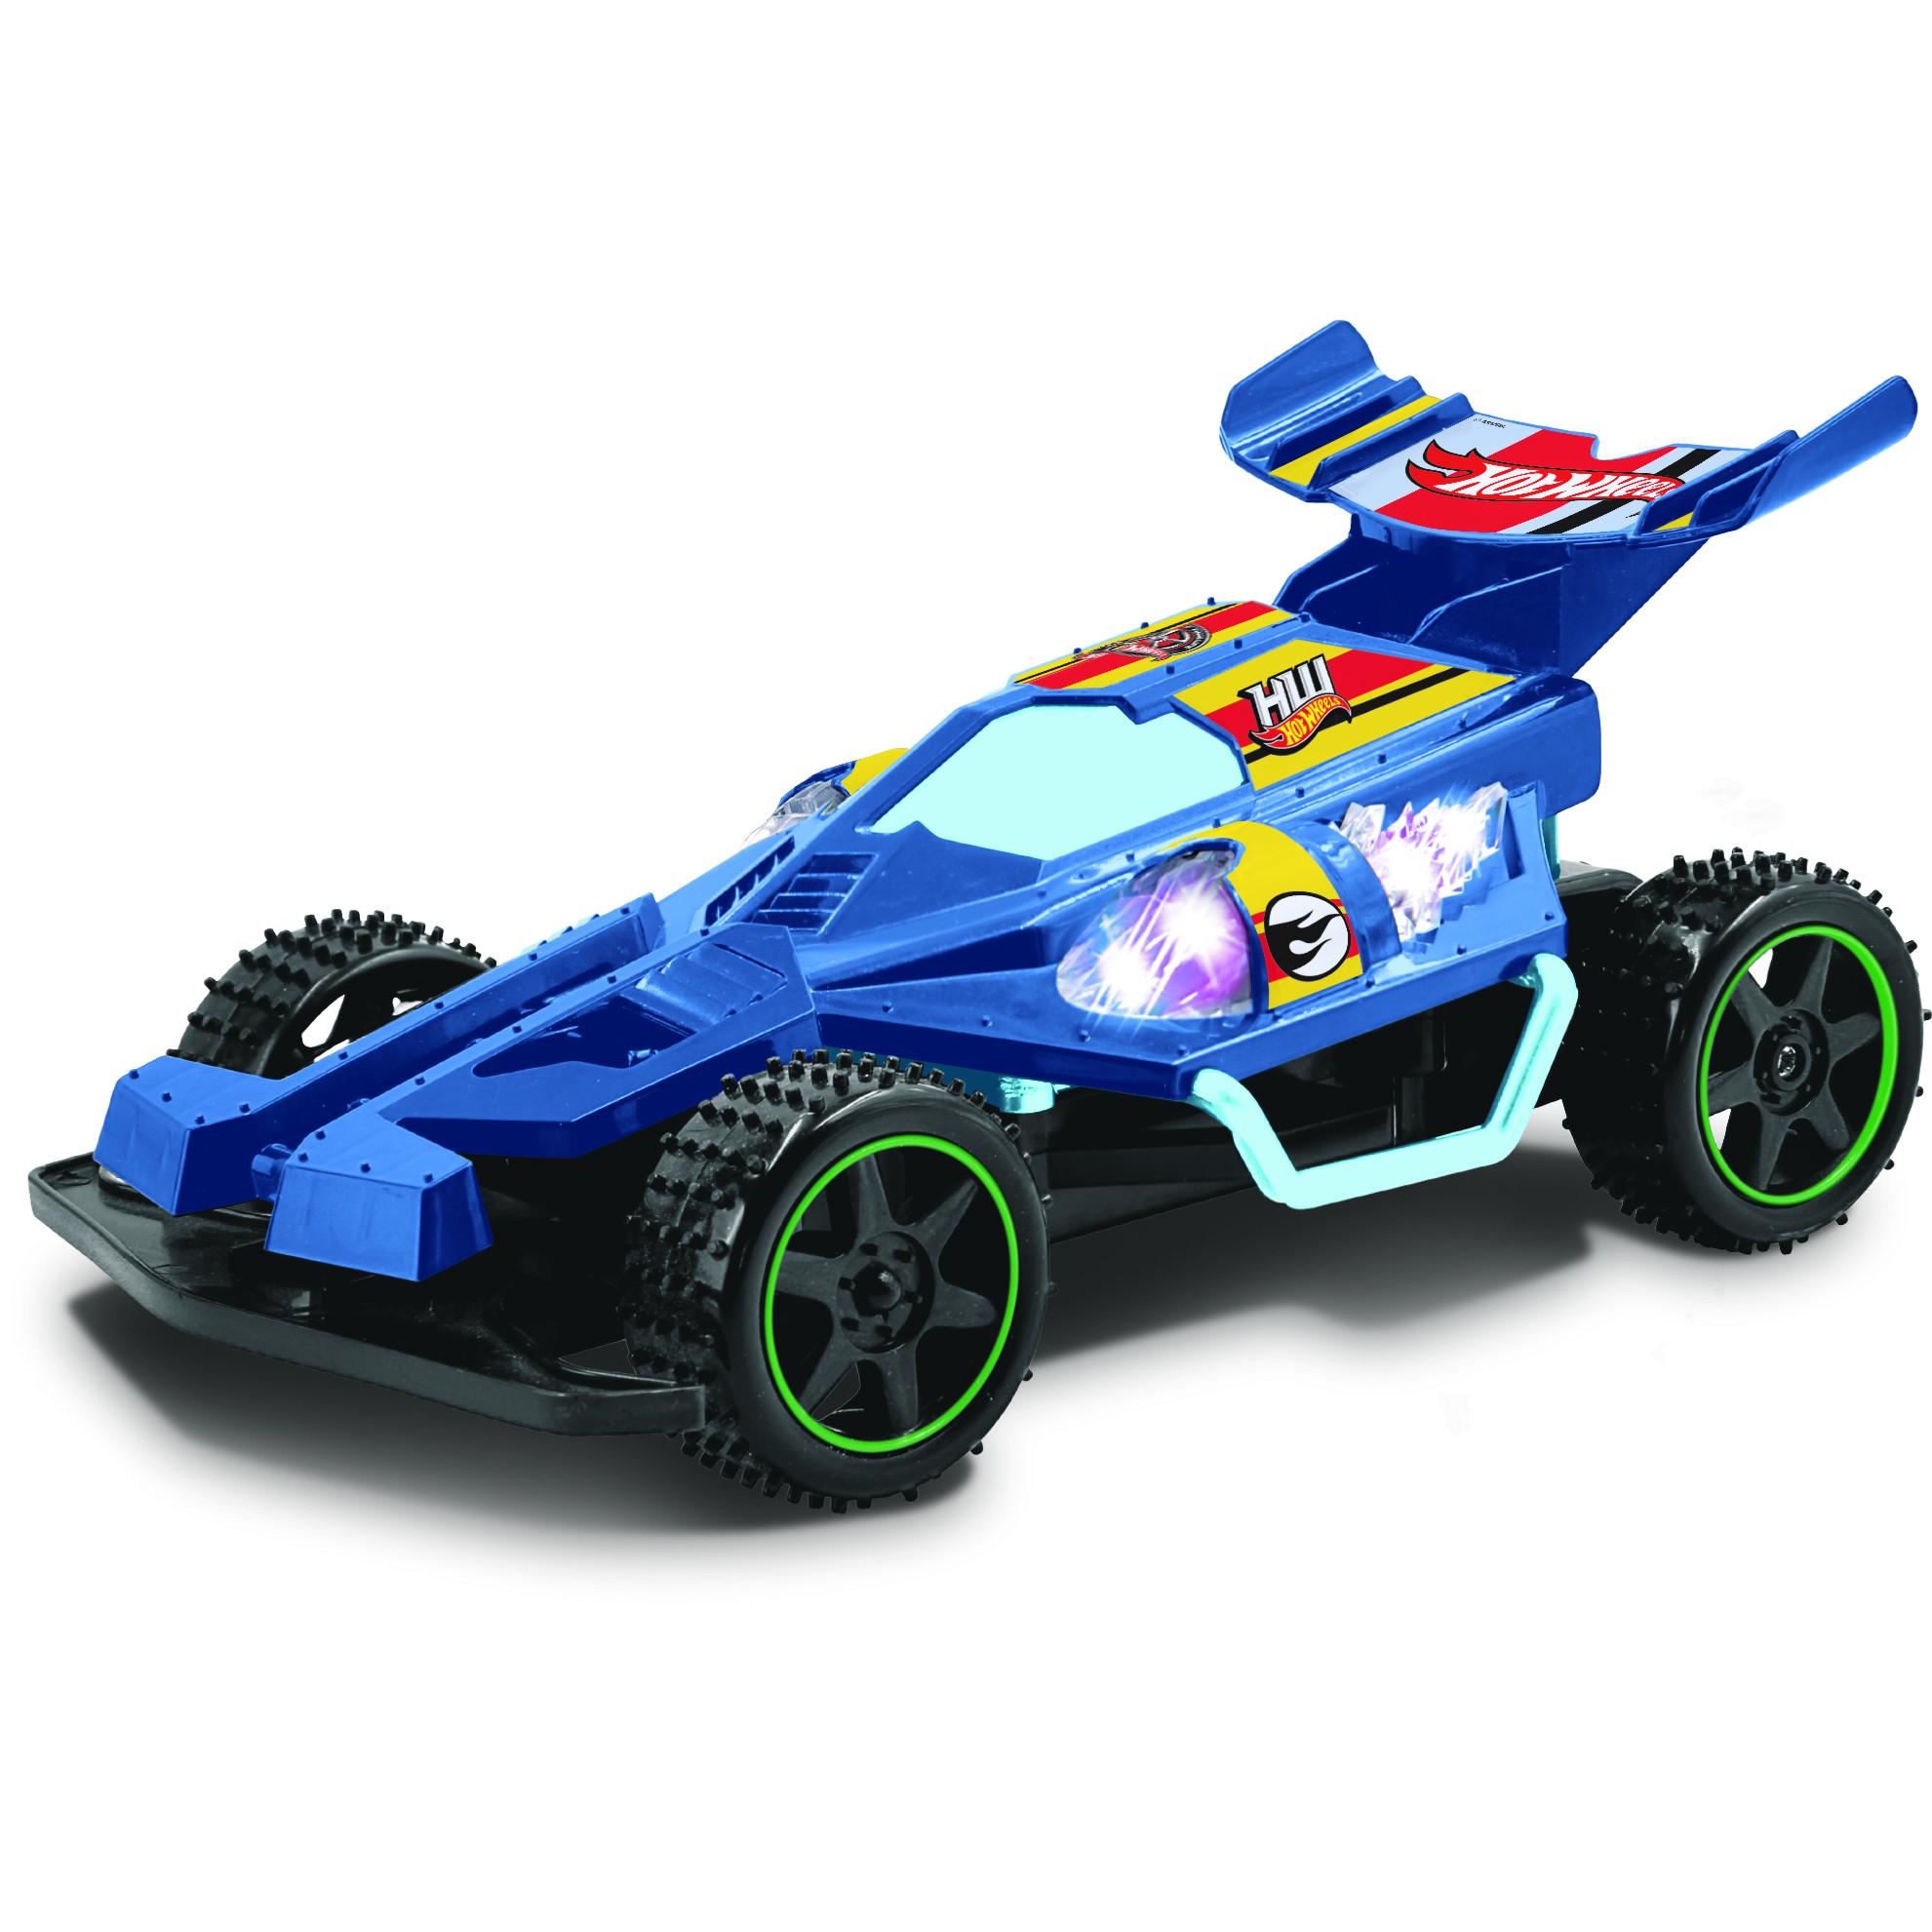 картинка Машинка на р/у Hot Wheels - багги, синий, масштаб 1:18, со светом от магазина Bebikam.ru